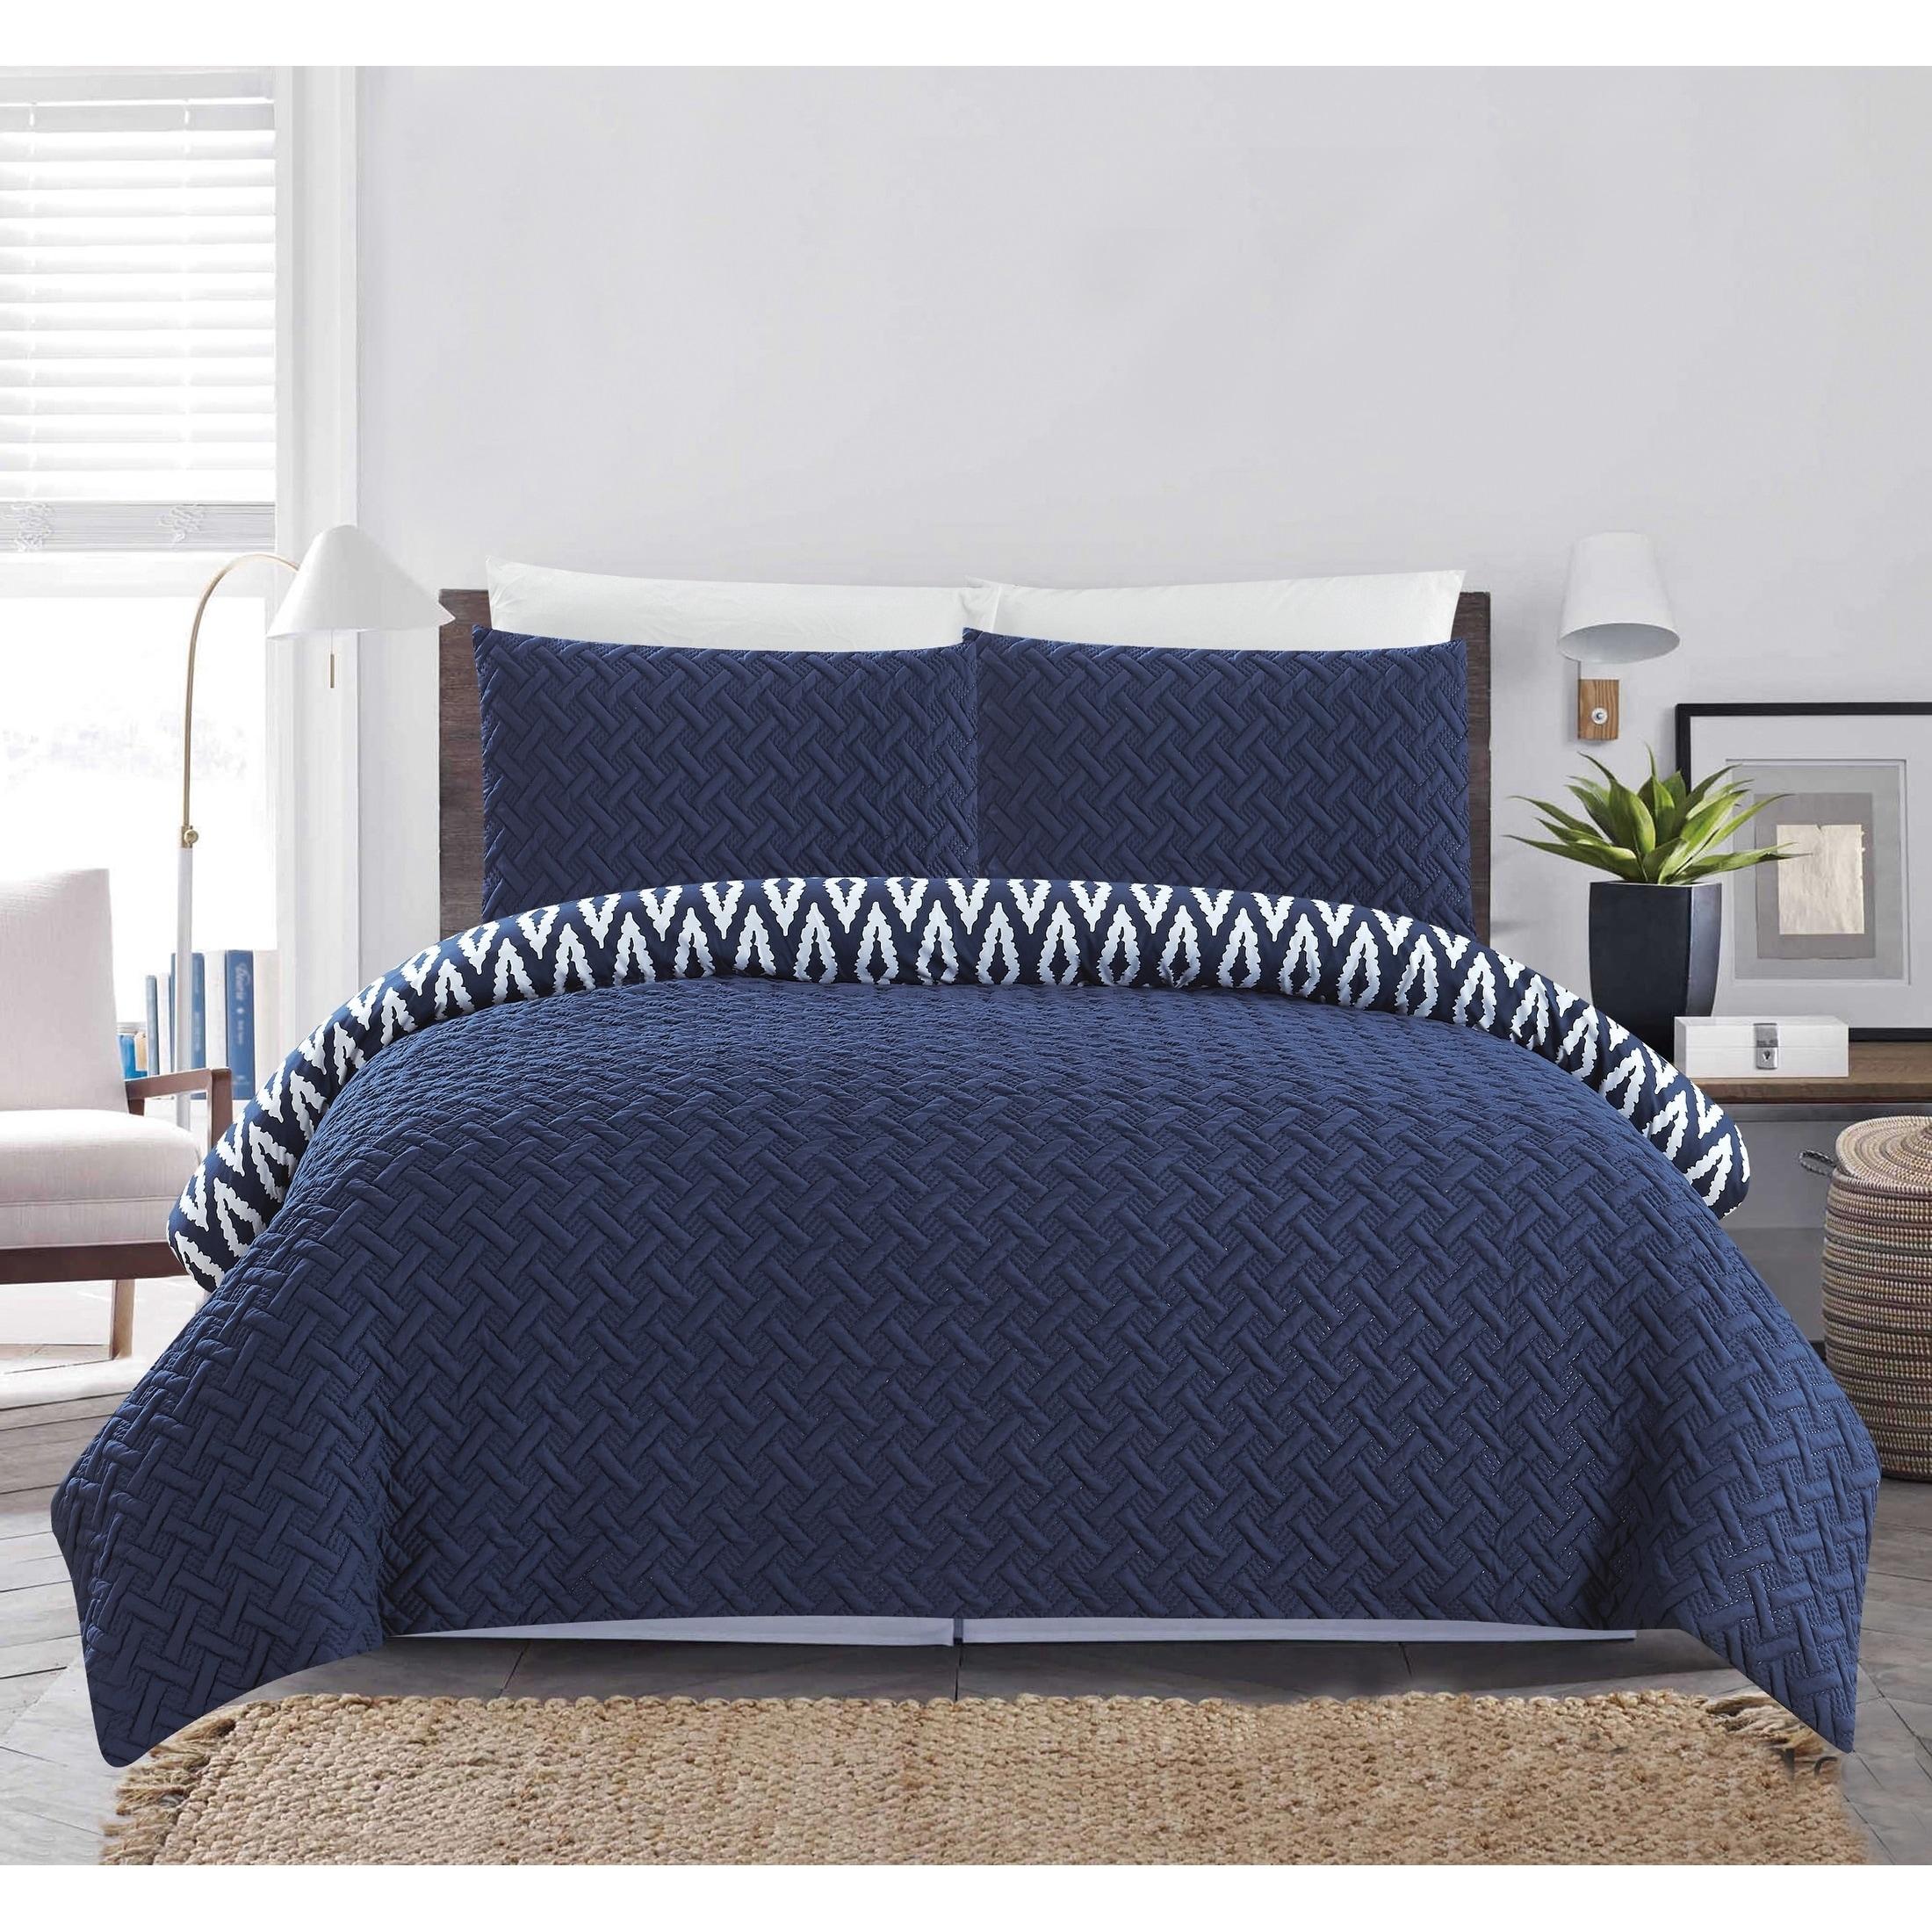 Queen or King Size Comforter Set Bedding Blue Embroidered Elegant Microfiber 7 P